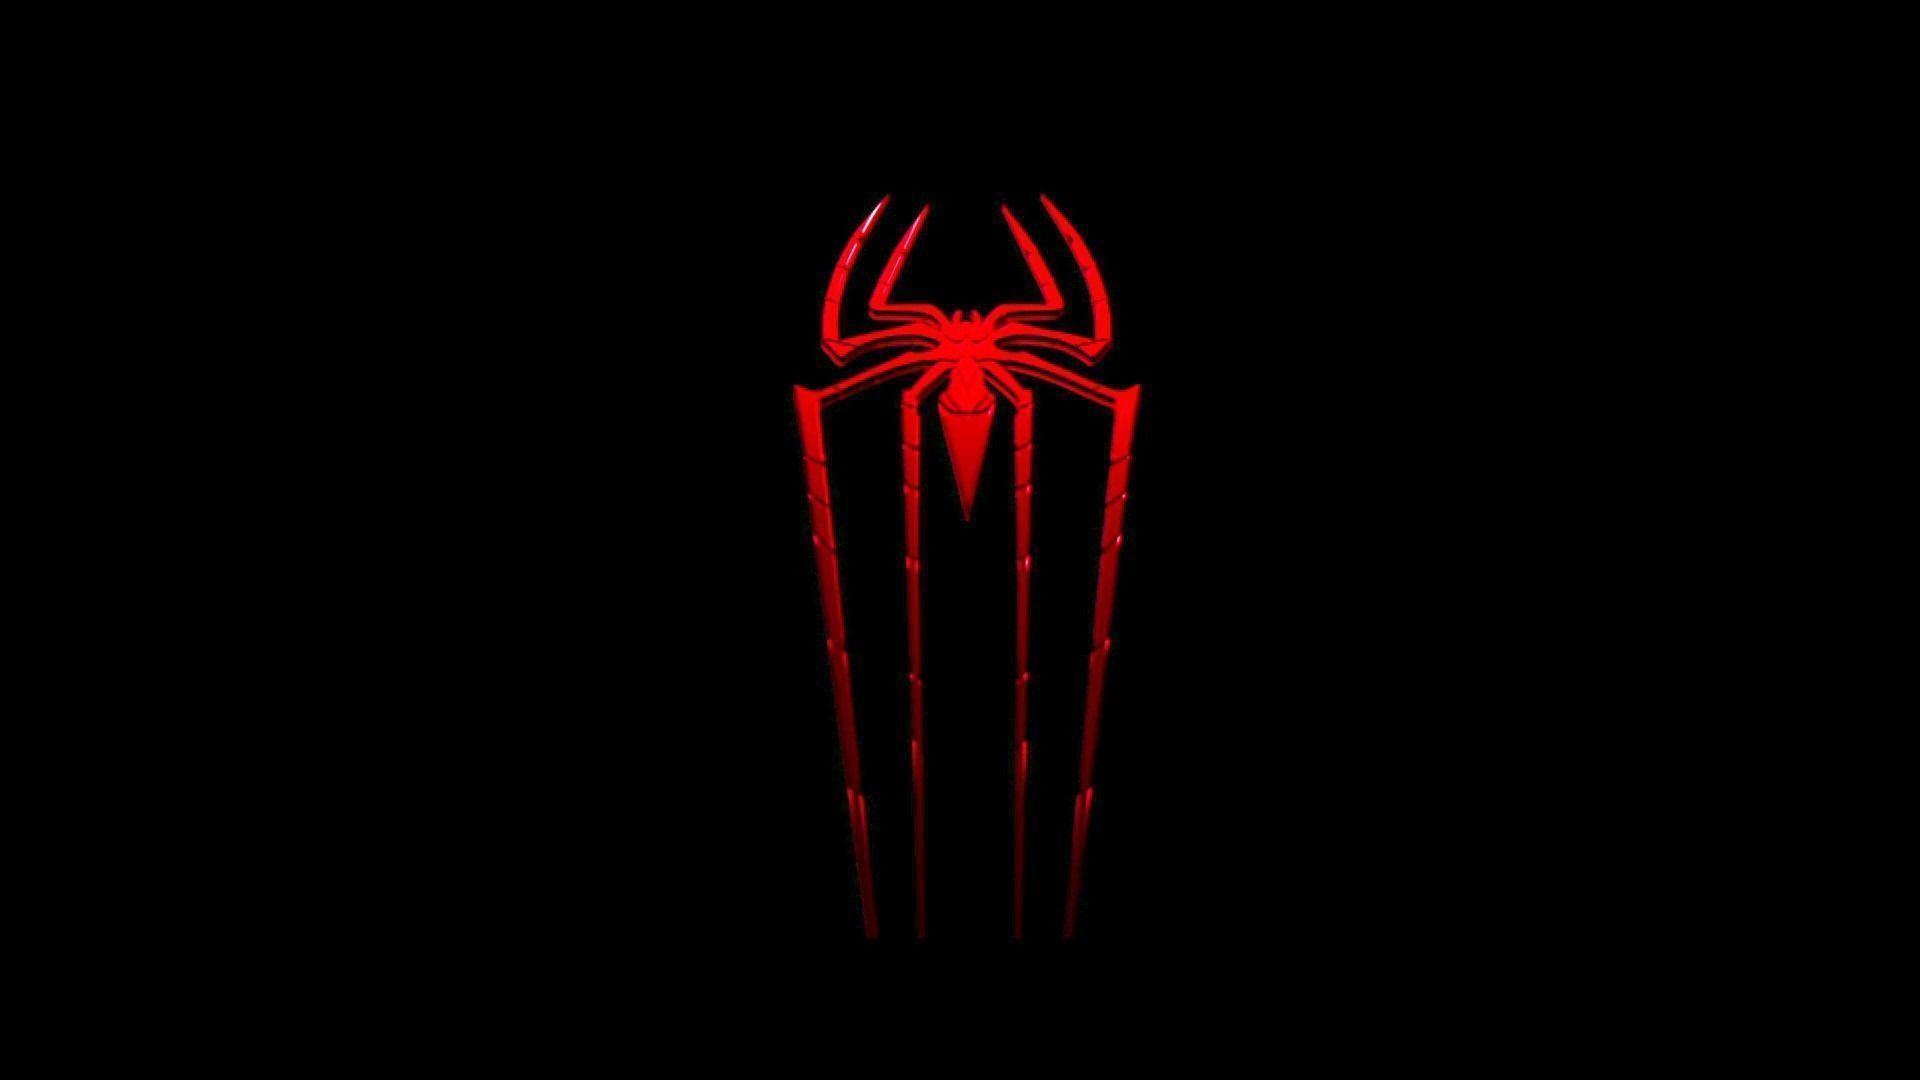 Spiderman Logo Wallpapers - Wallpaper Cave